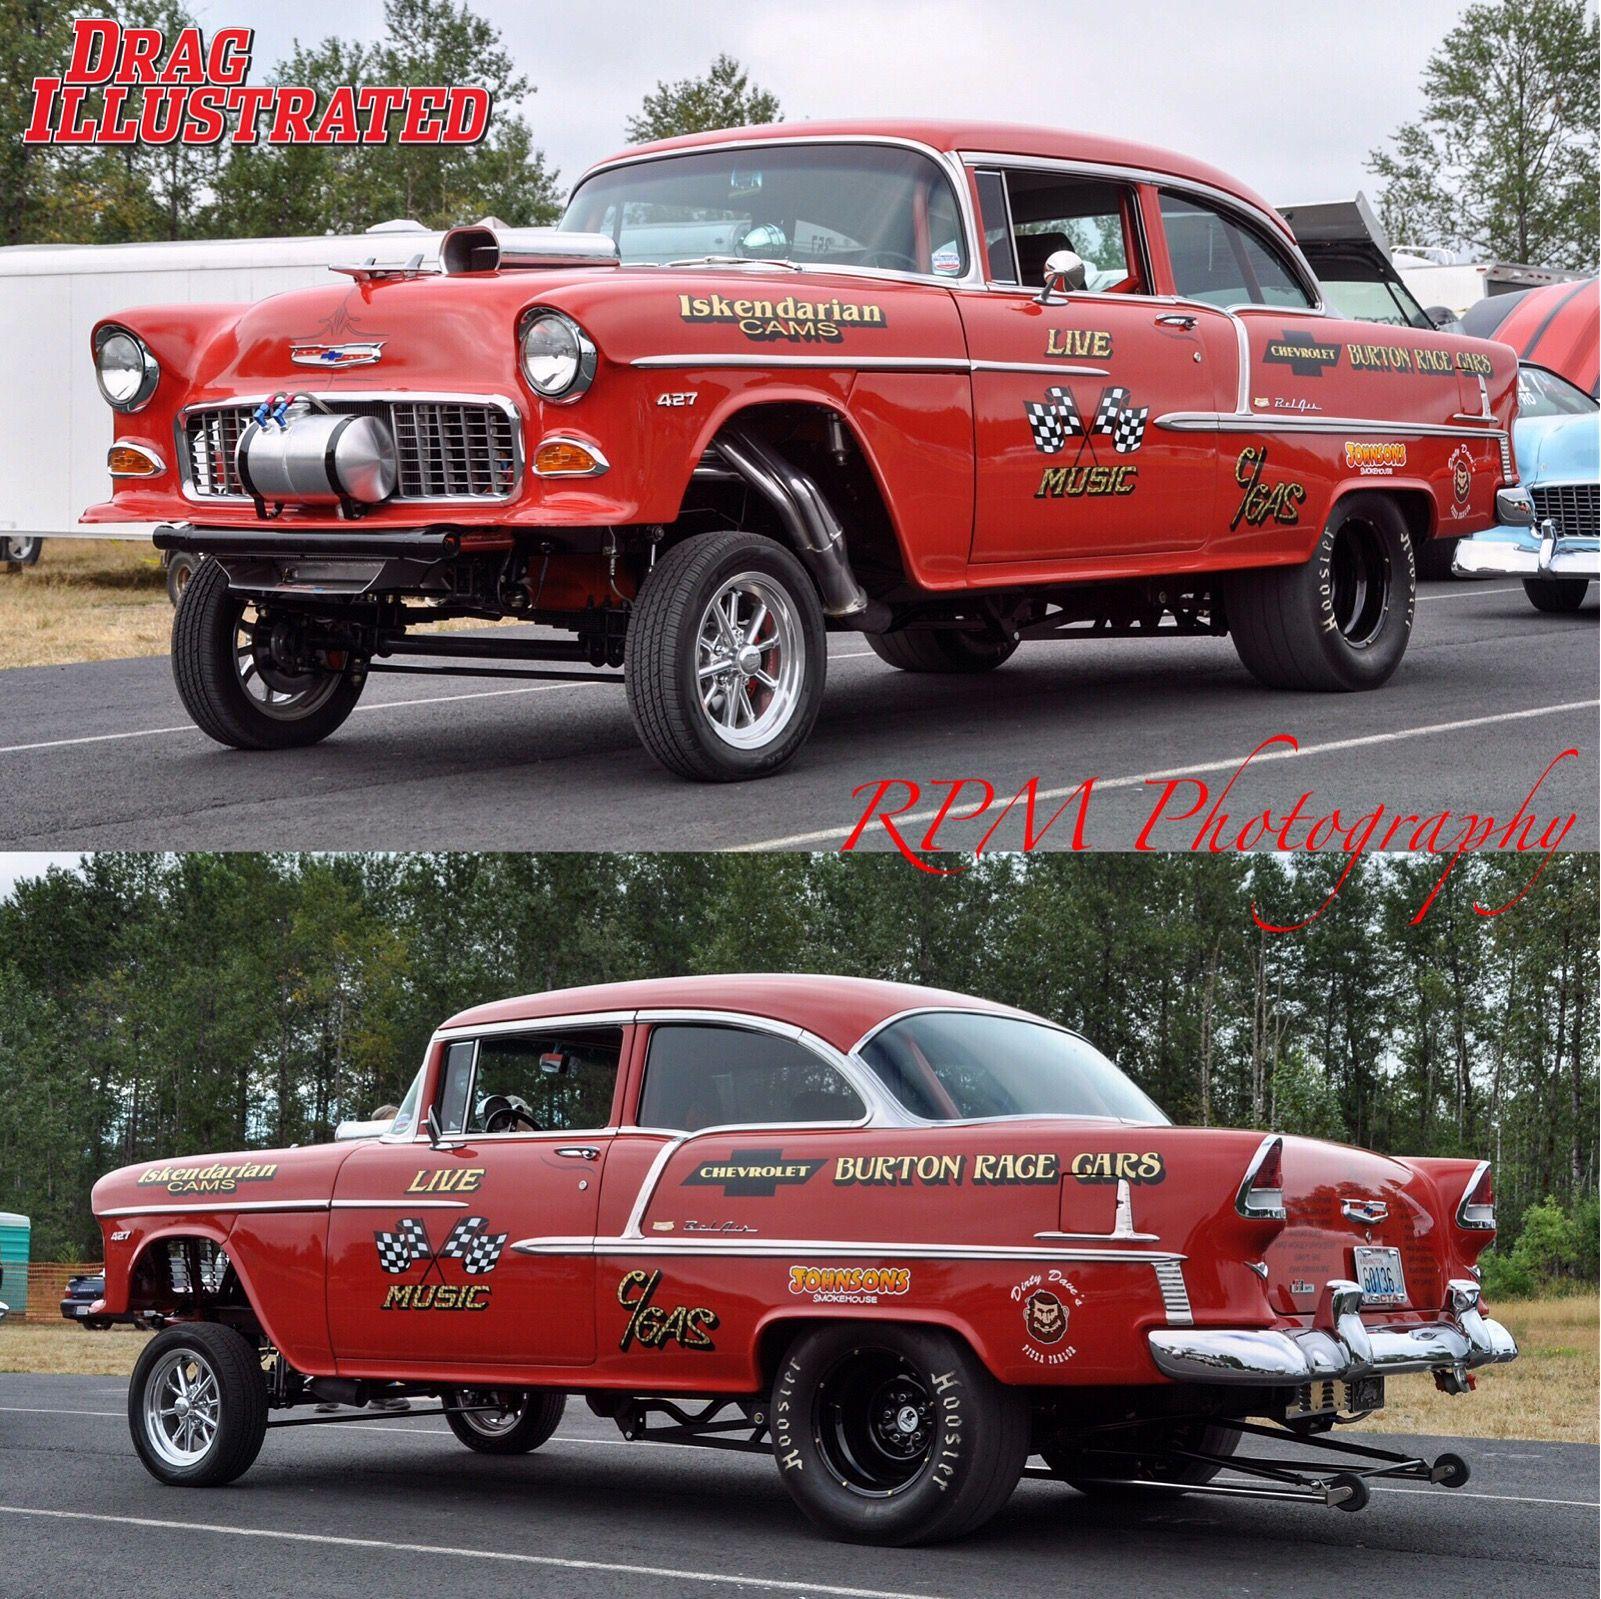 Cars, 1955 Chevy, Drag Cars